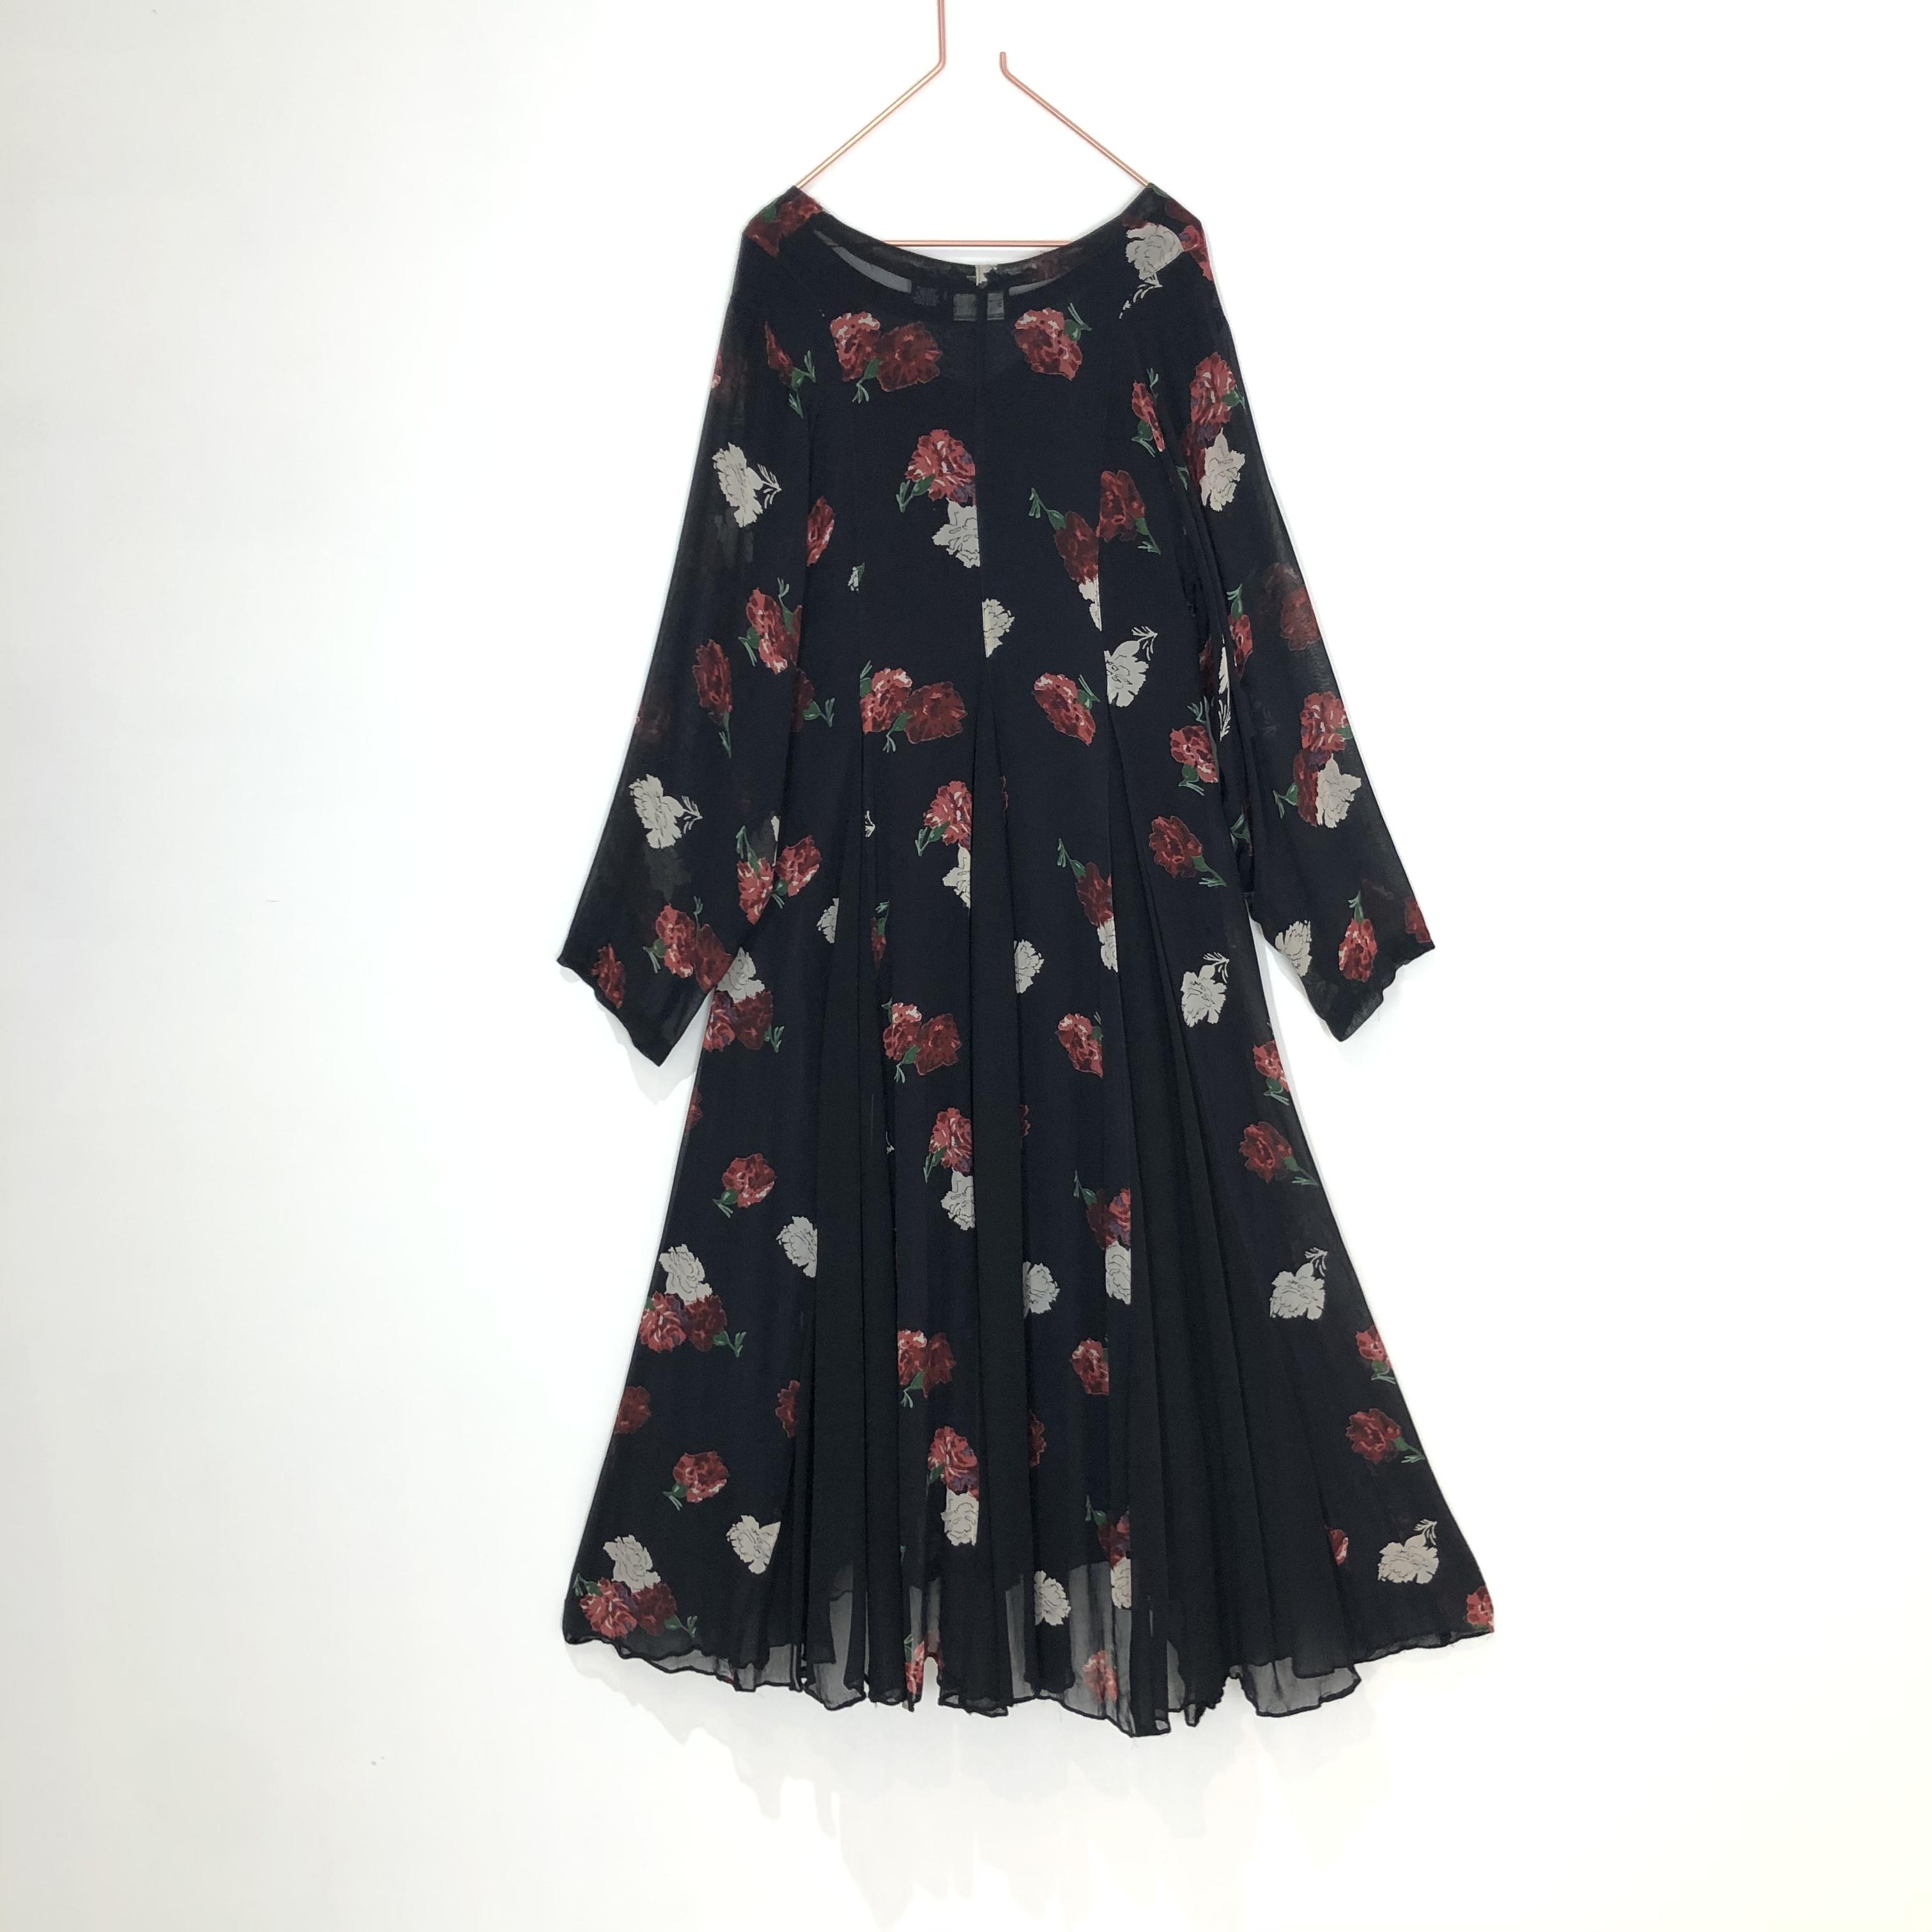 ◼︎90s carnation pattern sheer long dress from U.S.A.◼︎